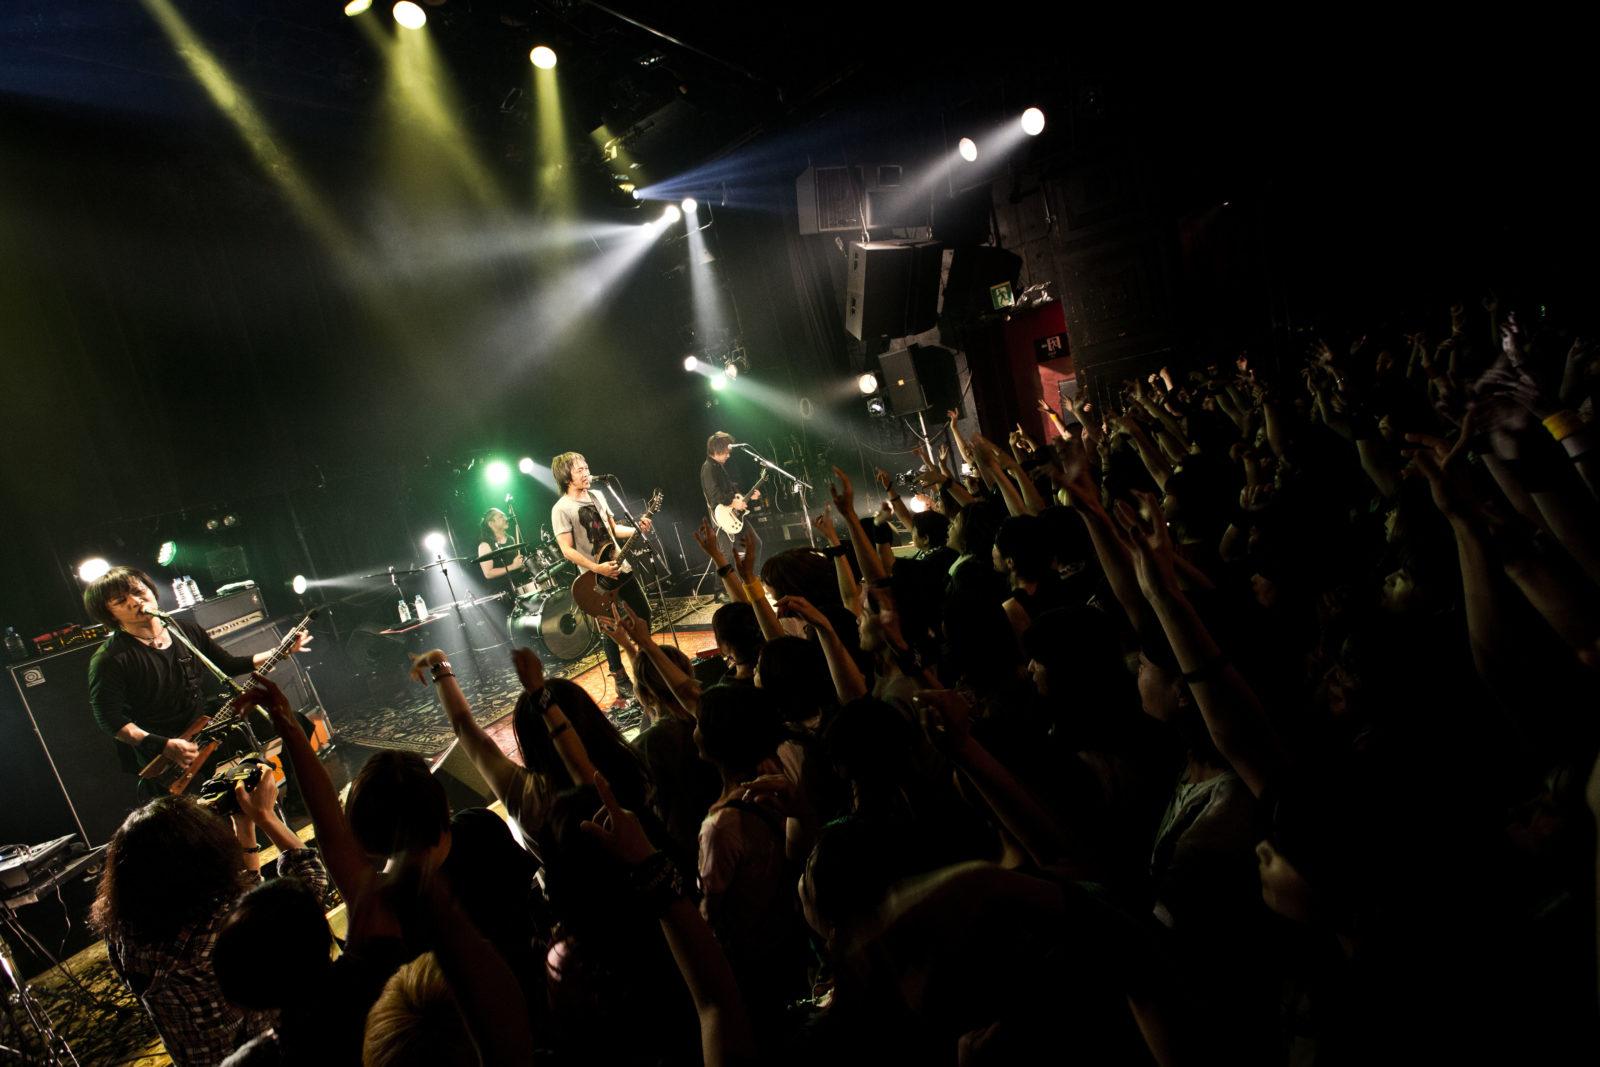 ZIGZO 約3年半振りの新曲を発表サムネイル画像